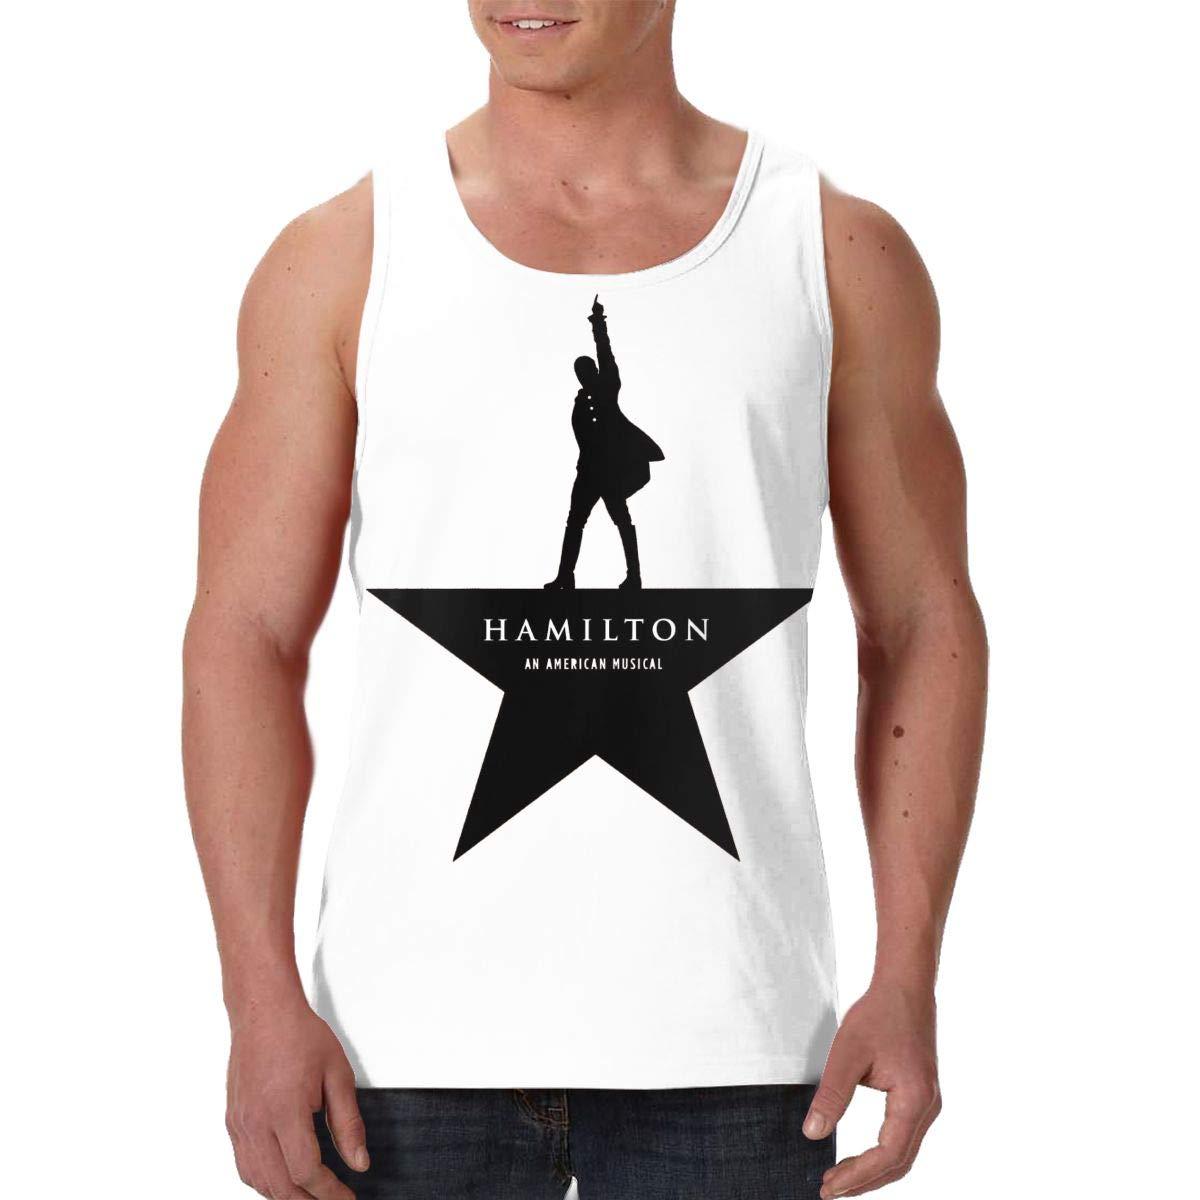 Martina Houston Musicals Hamilton American Musical Cool Breathable Tank Top Shirt